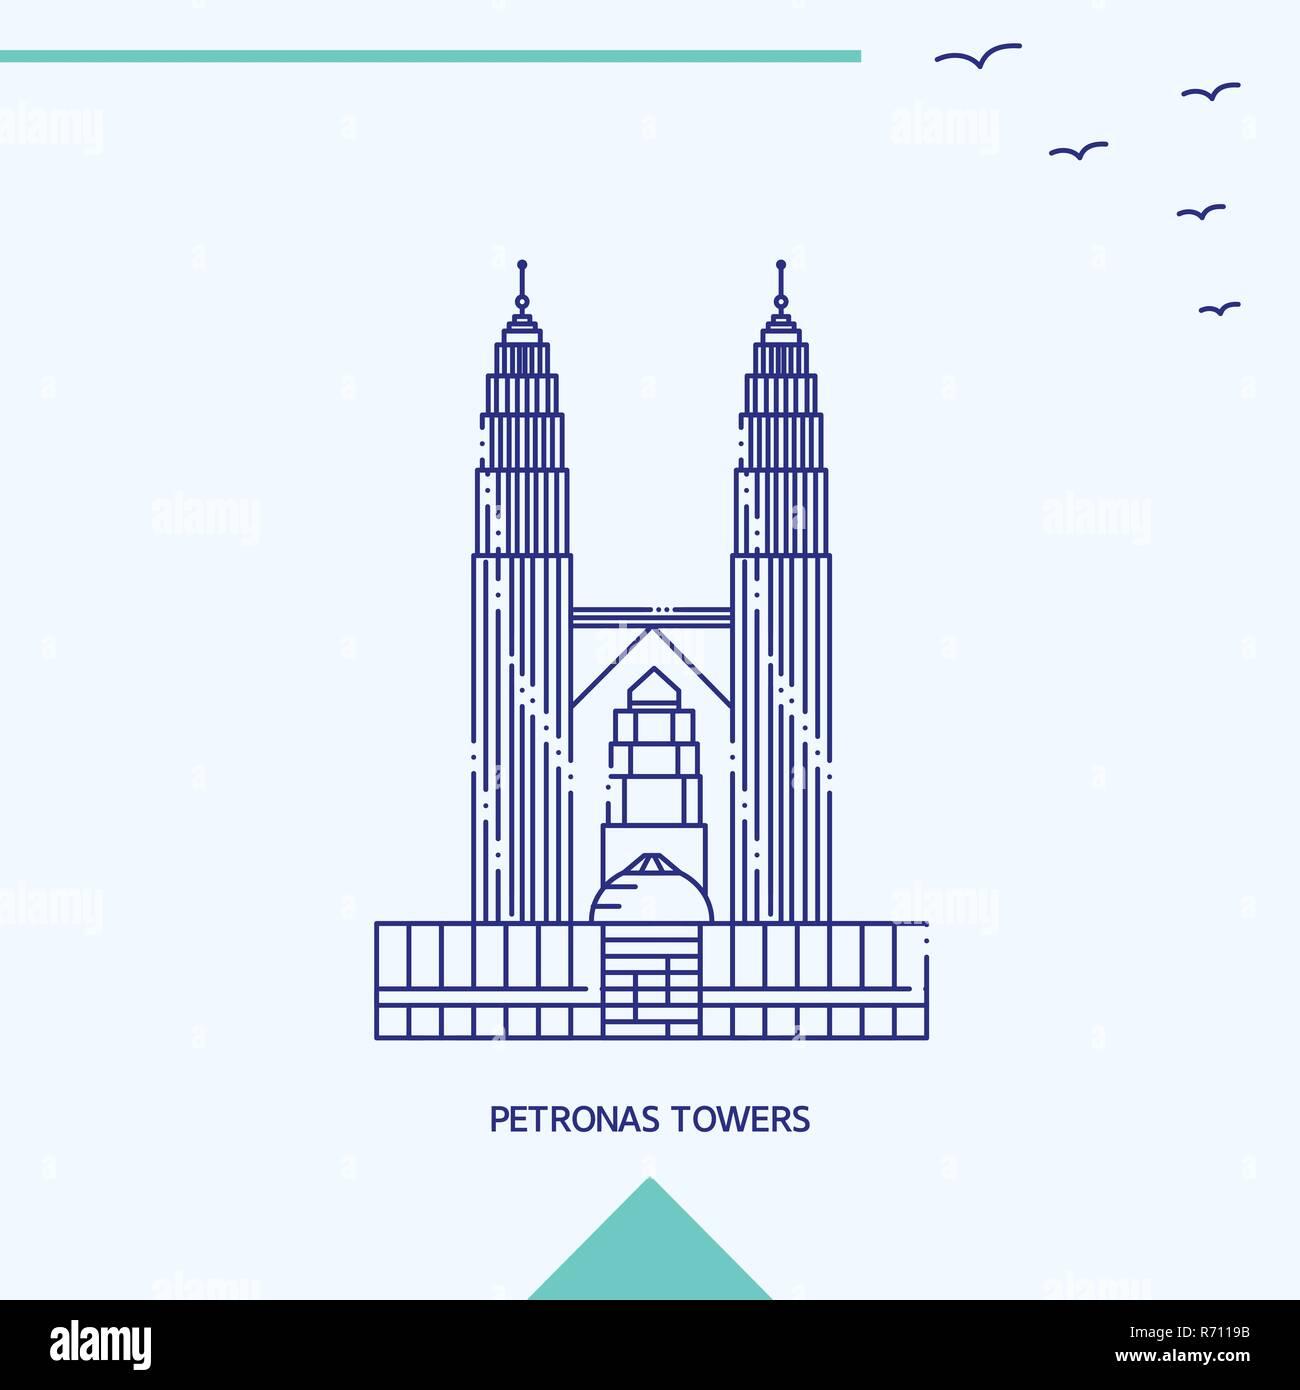 PETRONAS TOWERS skyline vector illustration - Stock Vector